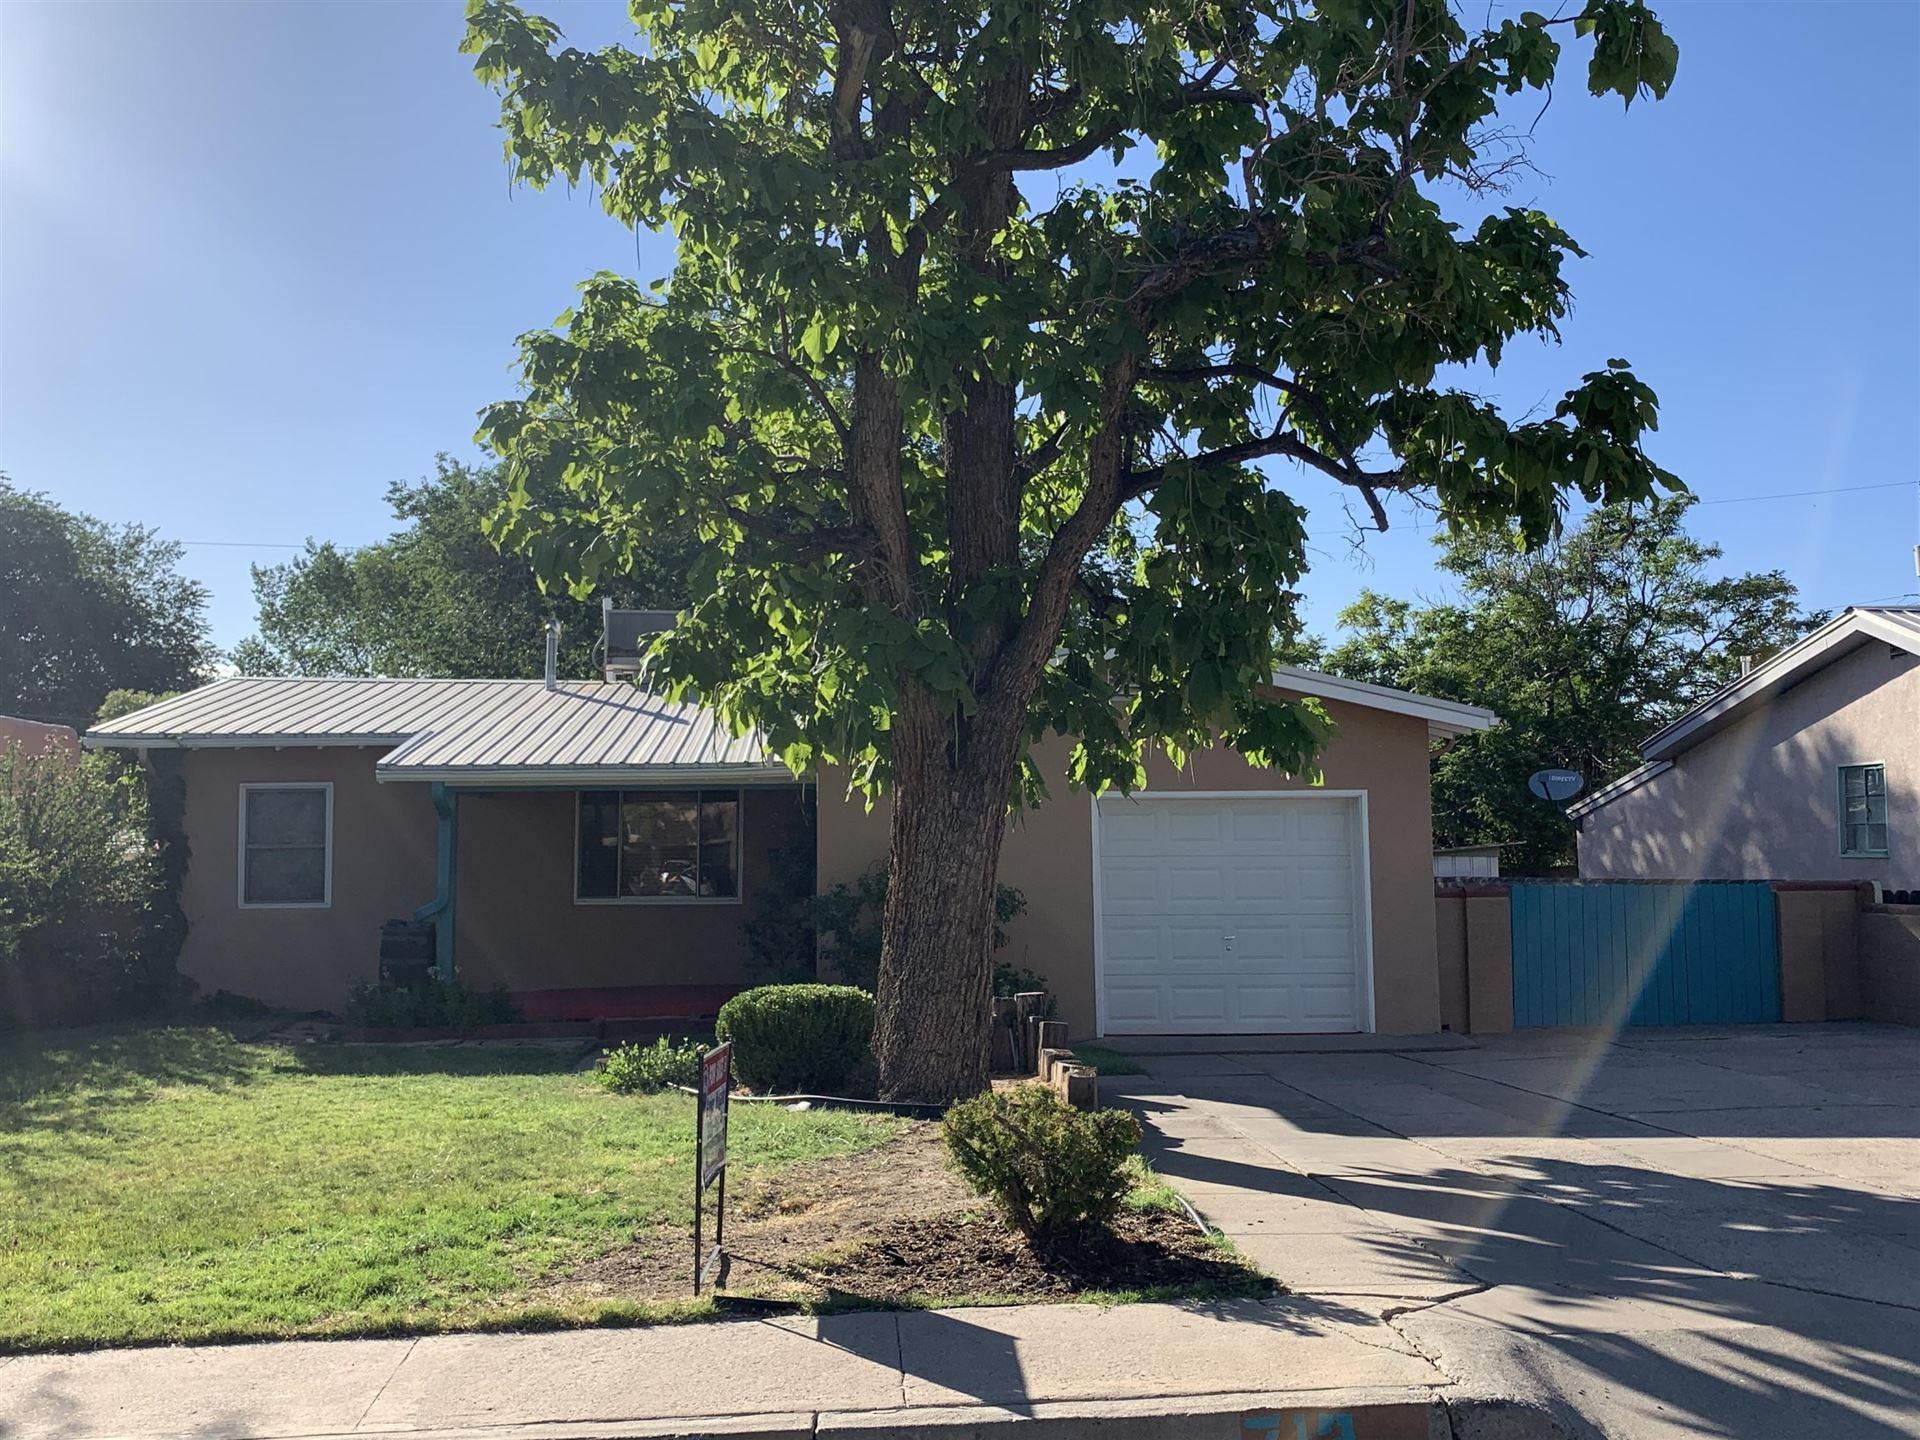 Photo of 713 VAN BUREN Place SE, Albuquerque, NM 87108 (MLS # 971834)